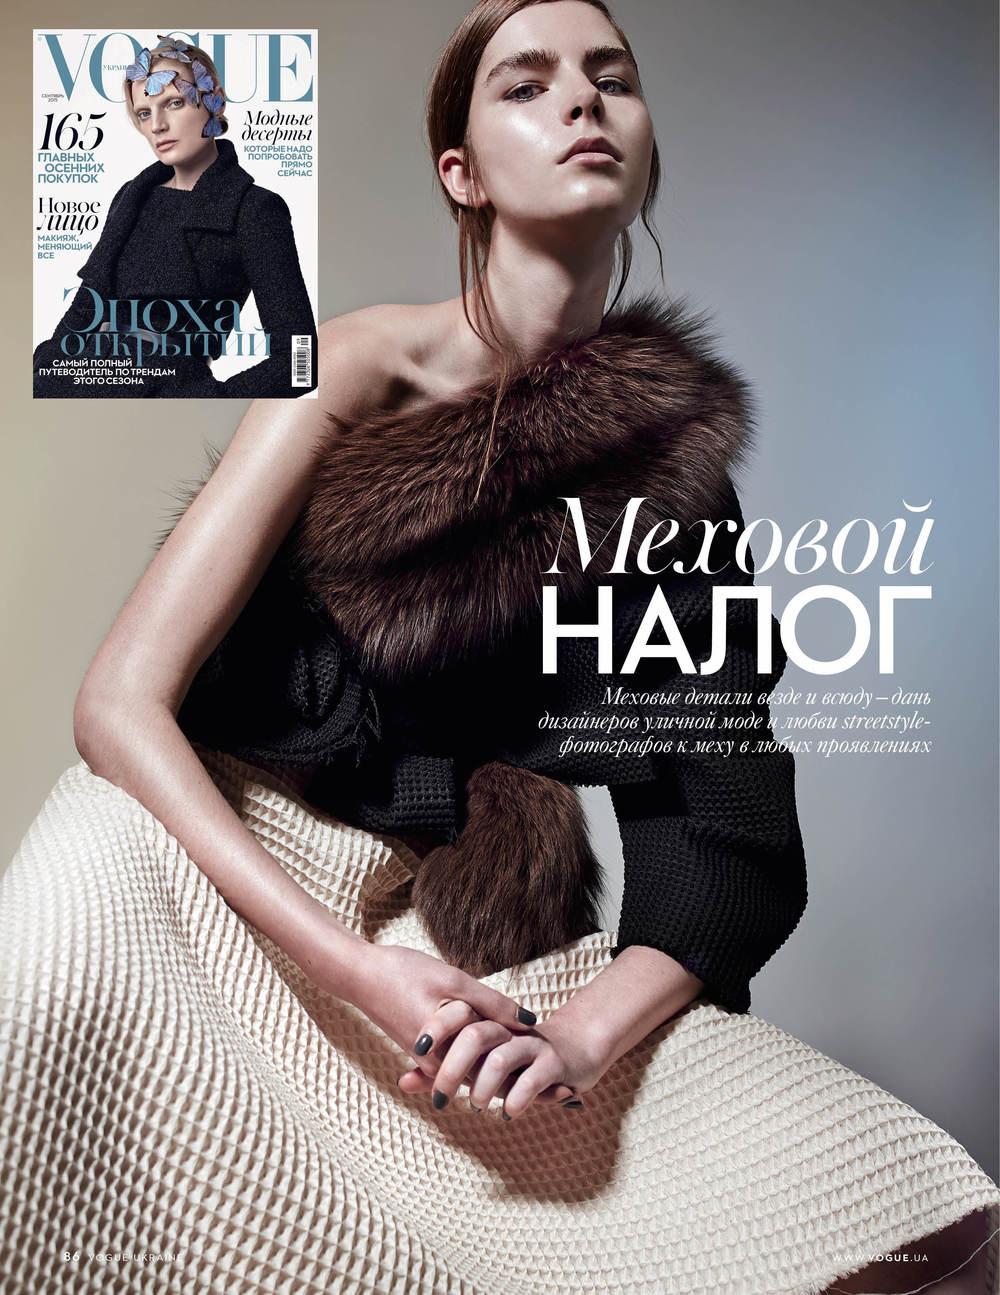 Vogue Ukraine Aug or Sept15 page86.jpg